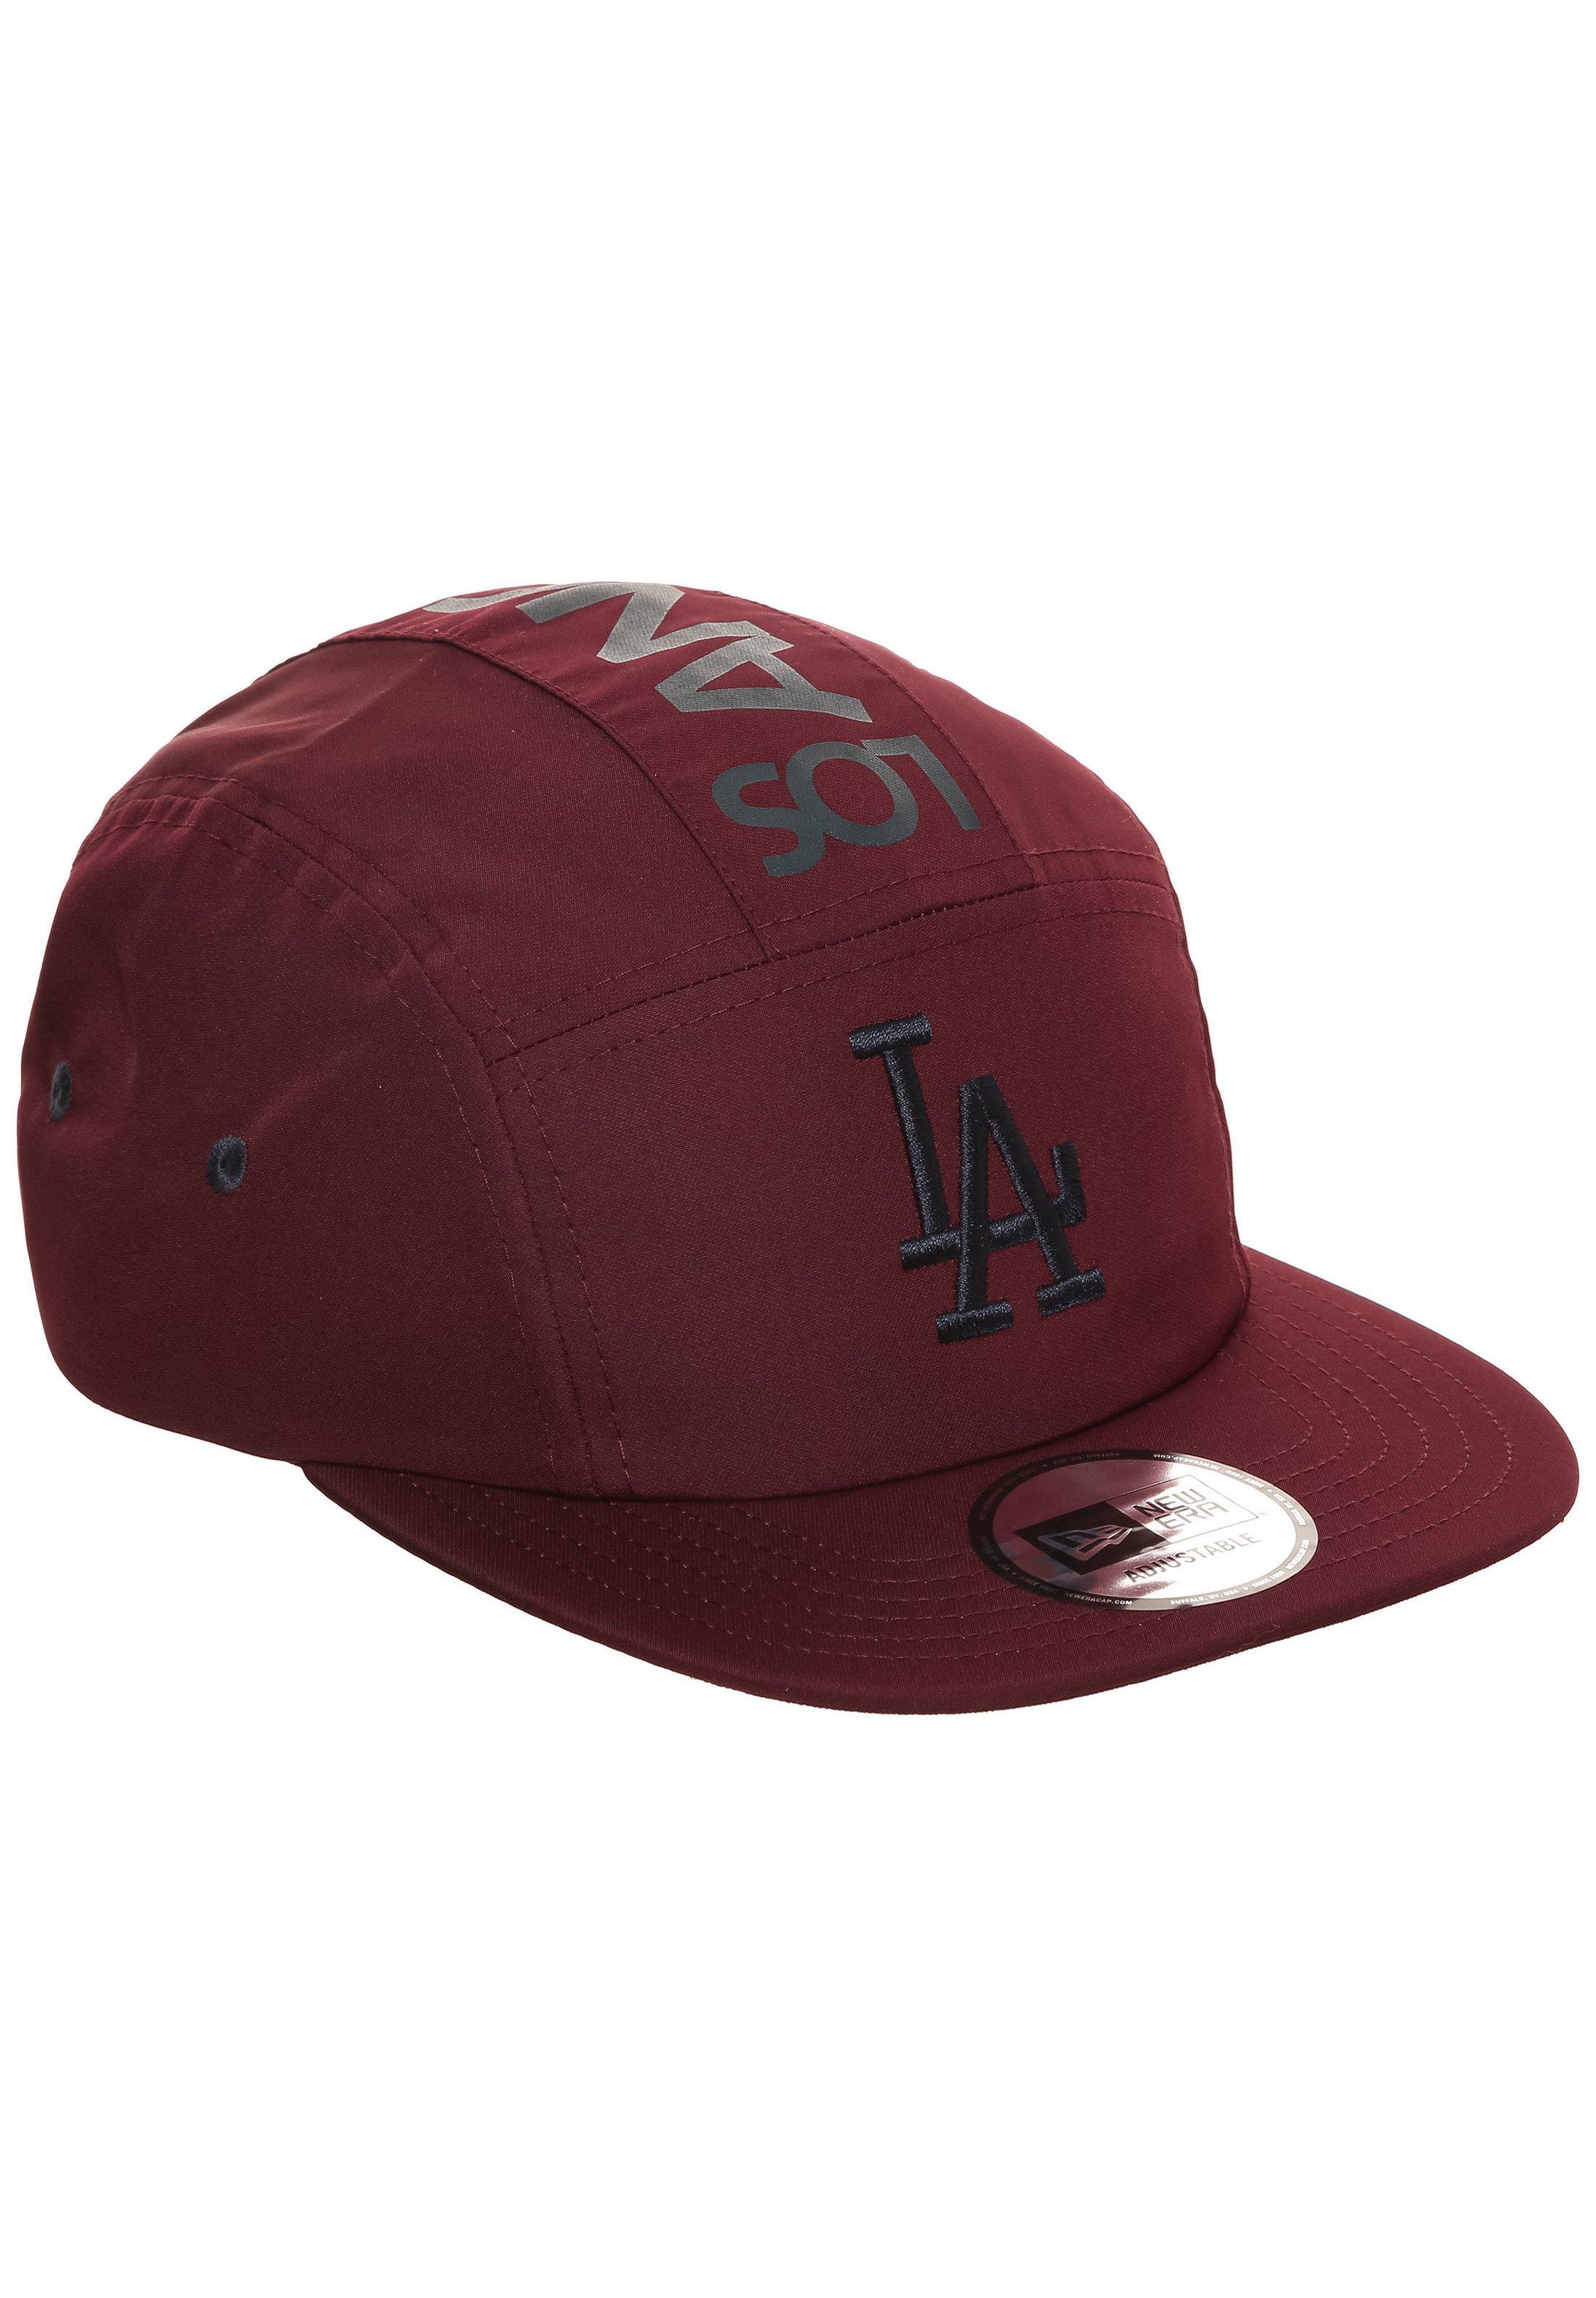 Homme MLB LOS ANGELES DODGERS CAMPER CAP - Casquette